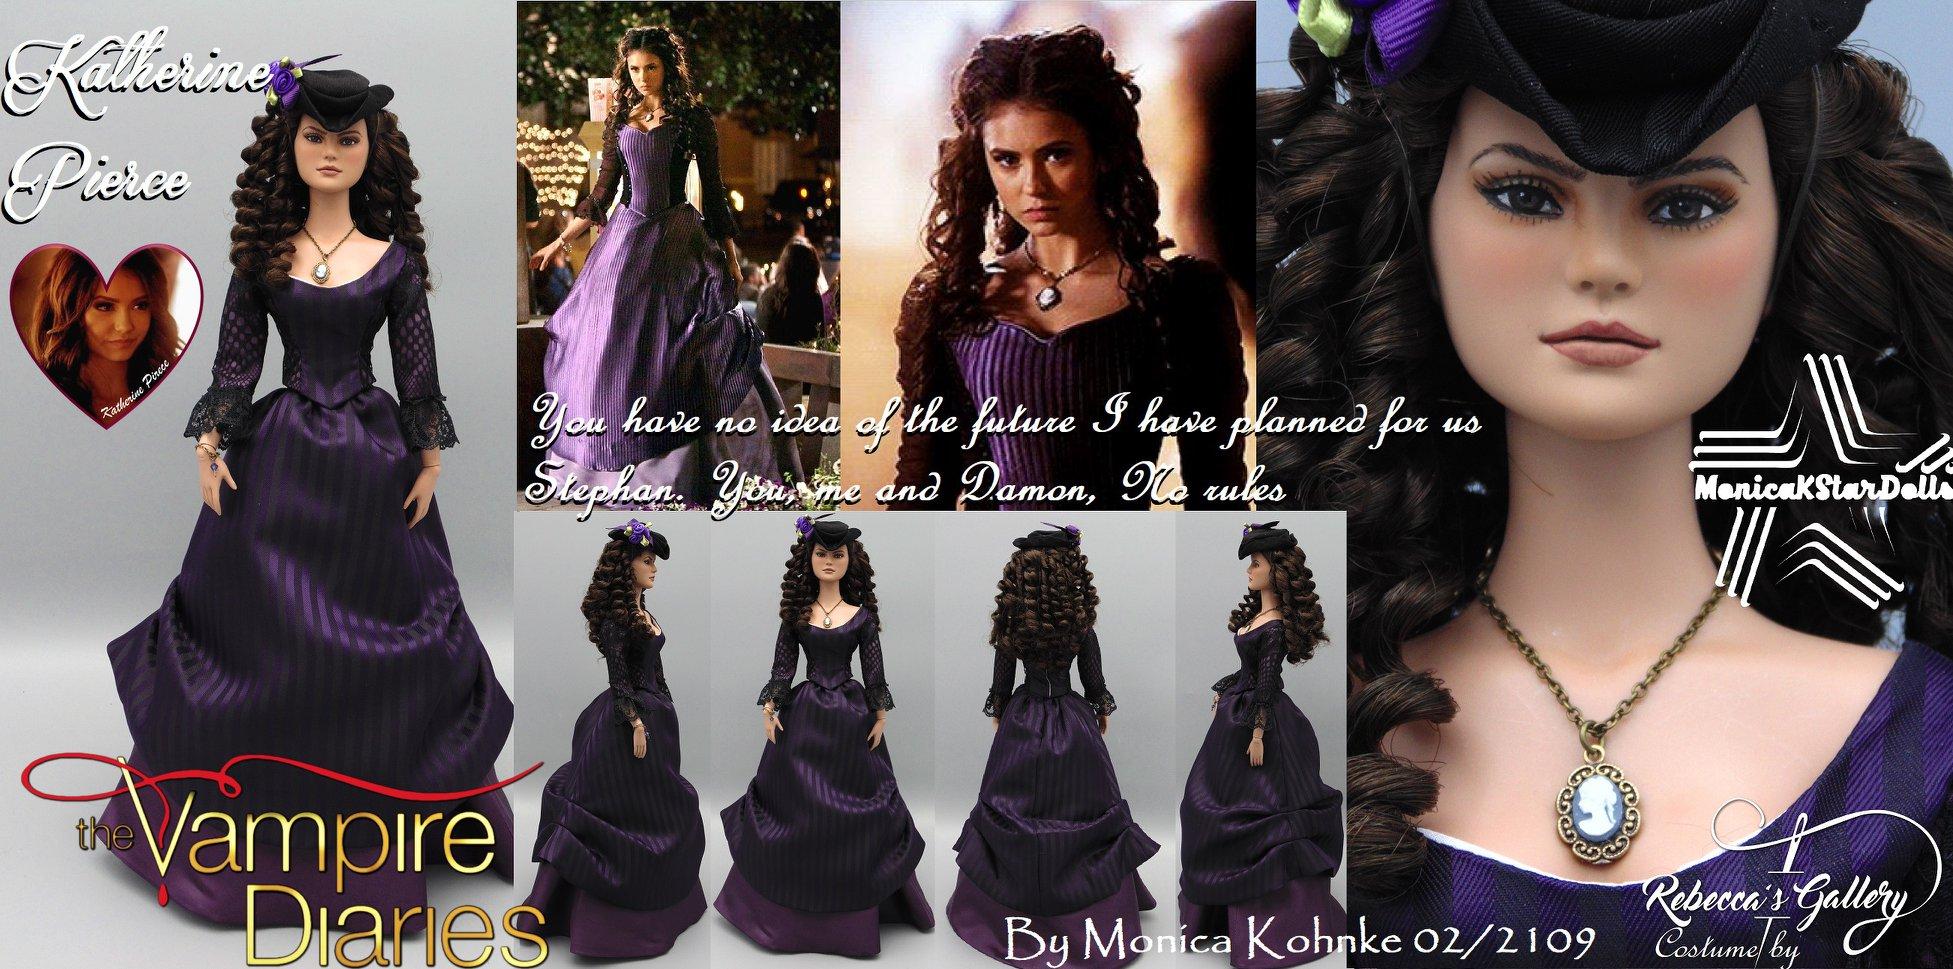 Katerine Pierce Vampire Diaries